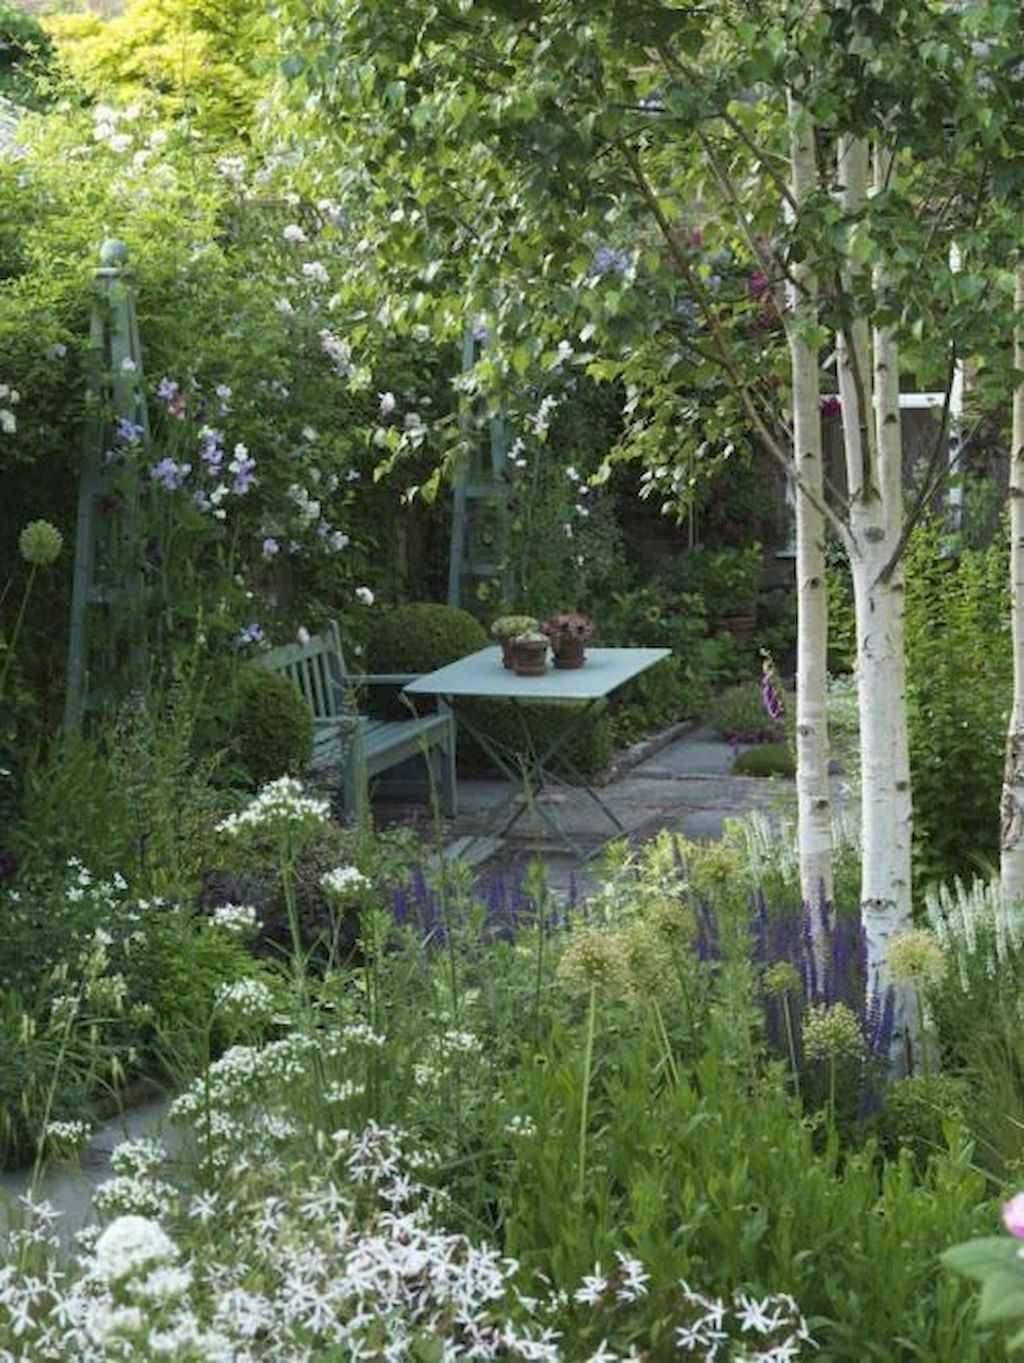 85 Stunning Small Cottage Garden Ideas for Backyard Landscaping #cottagegardens